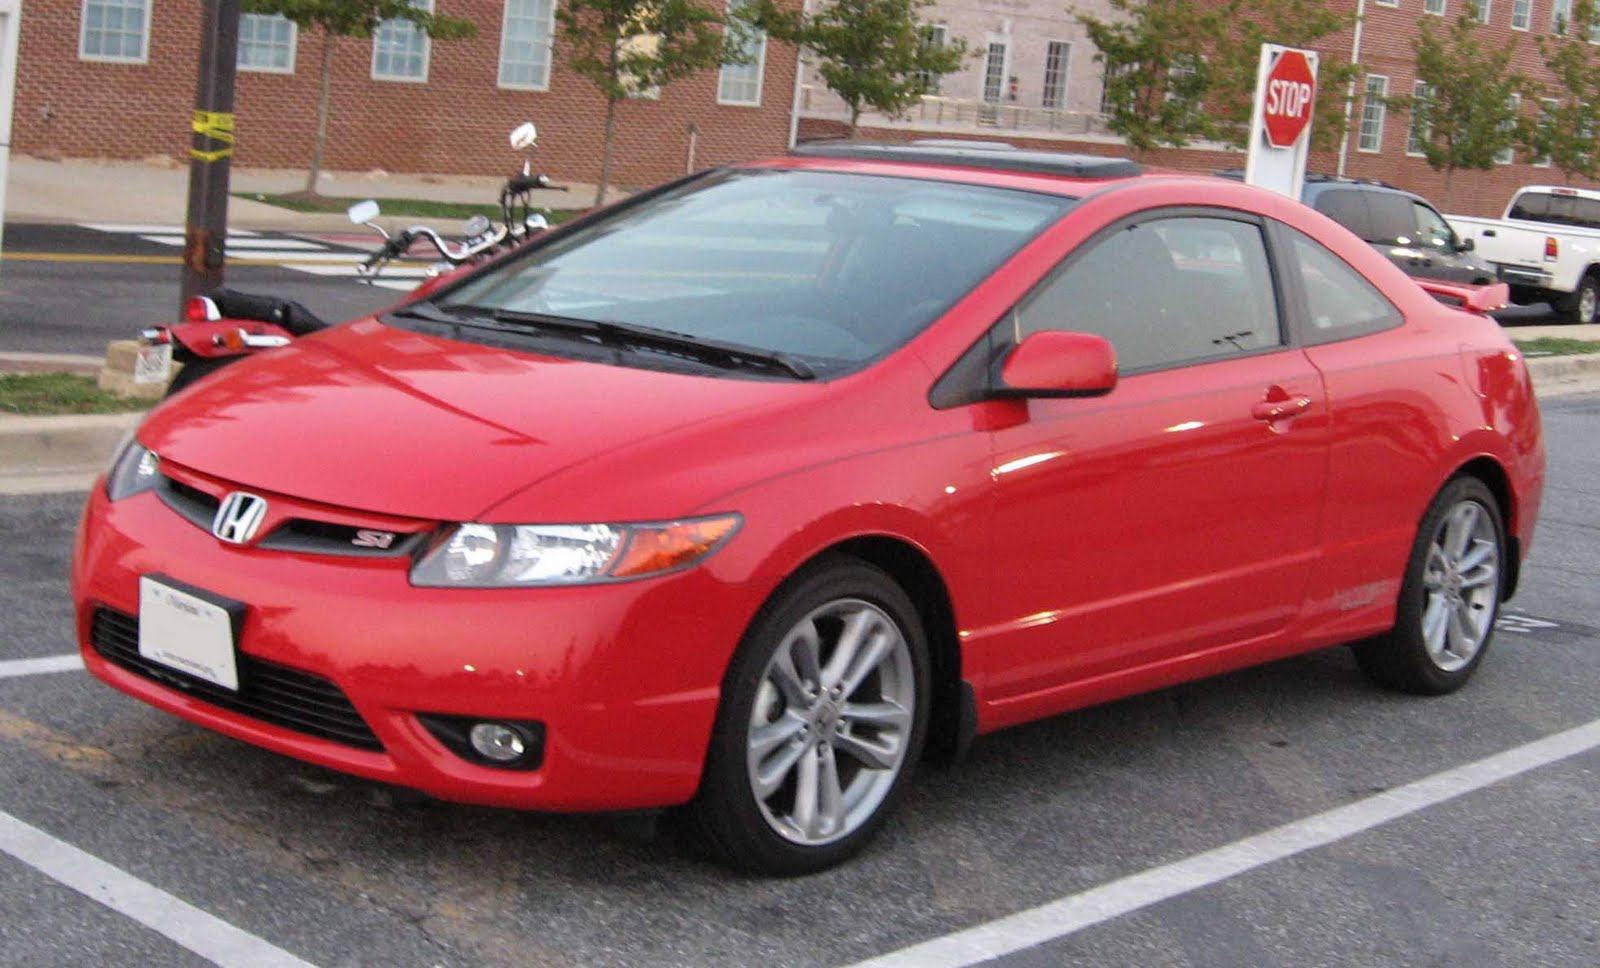 Honda Civic 2010 Coupe